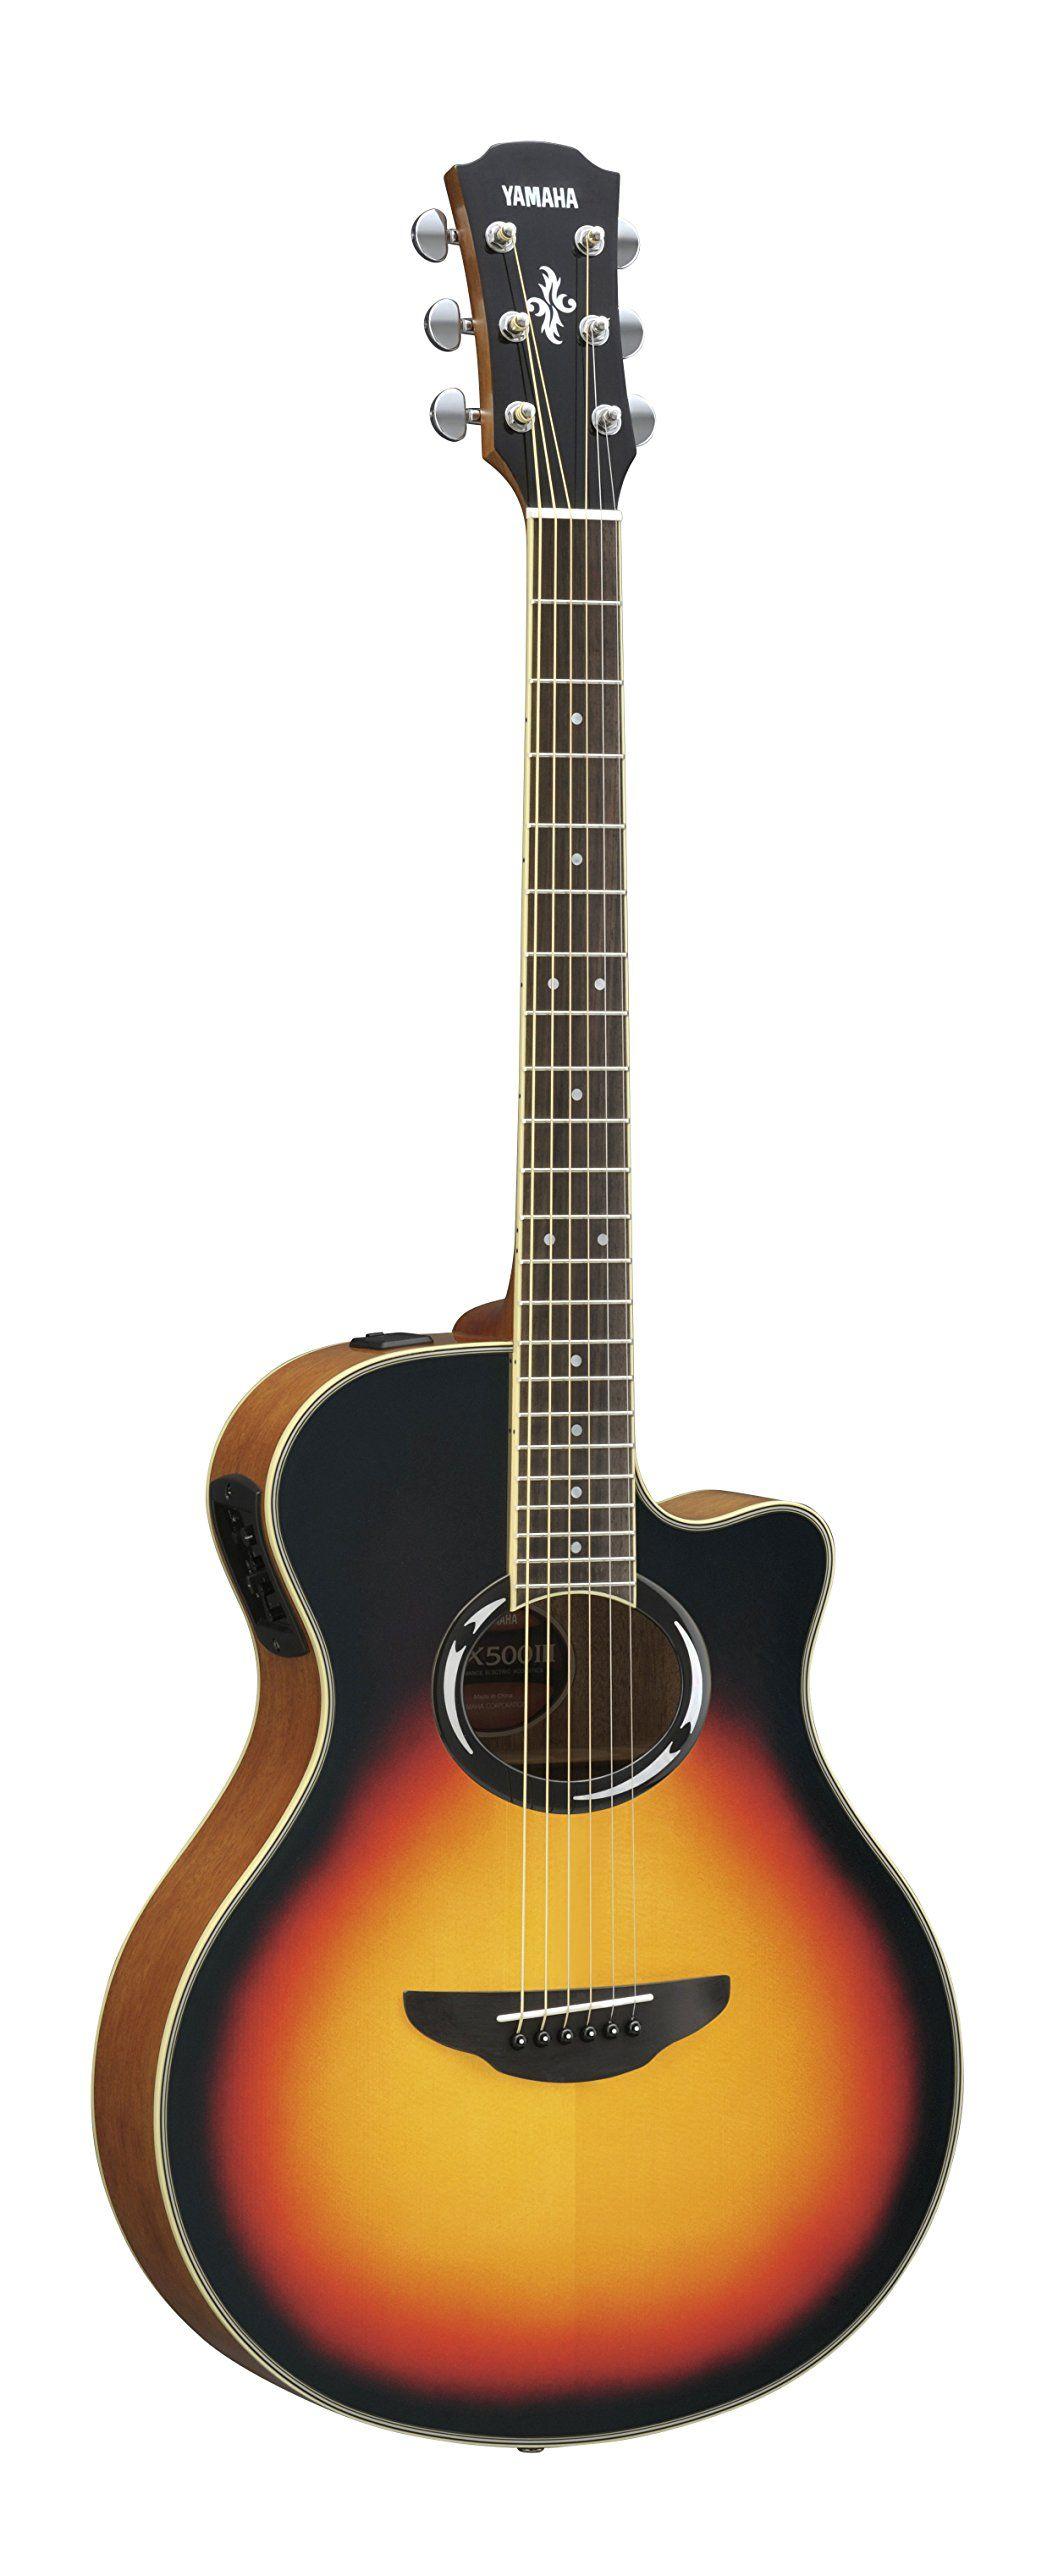 yamaha apx500iii thinline cutaway acoustic-electric guitar,Wiring diagram,Yamaha Guitar Apx 7 Wiring Diagram